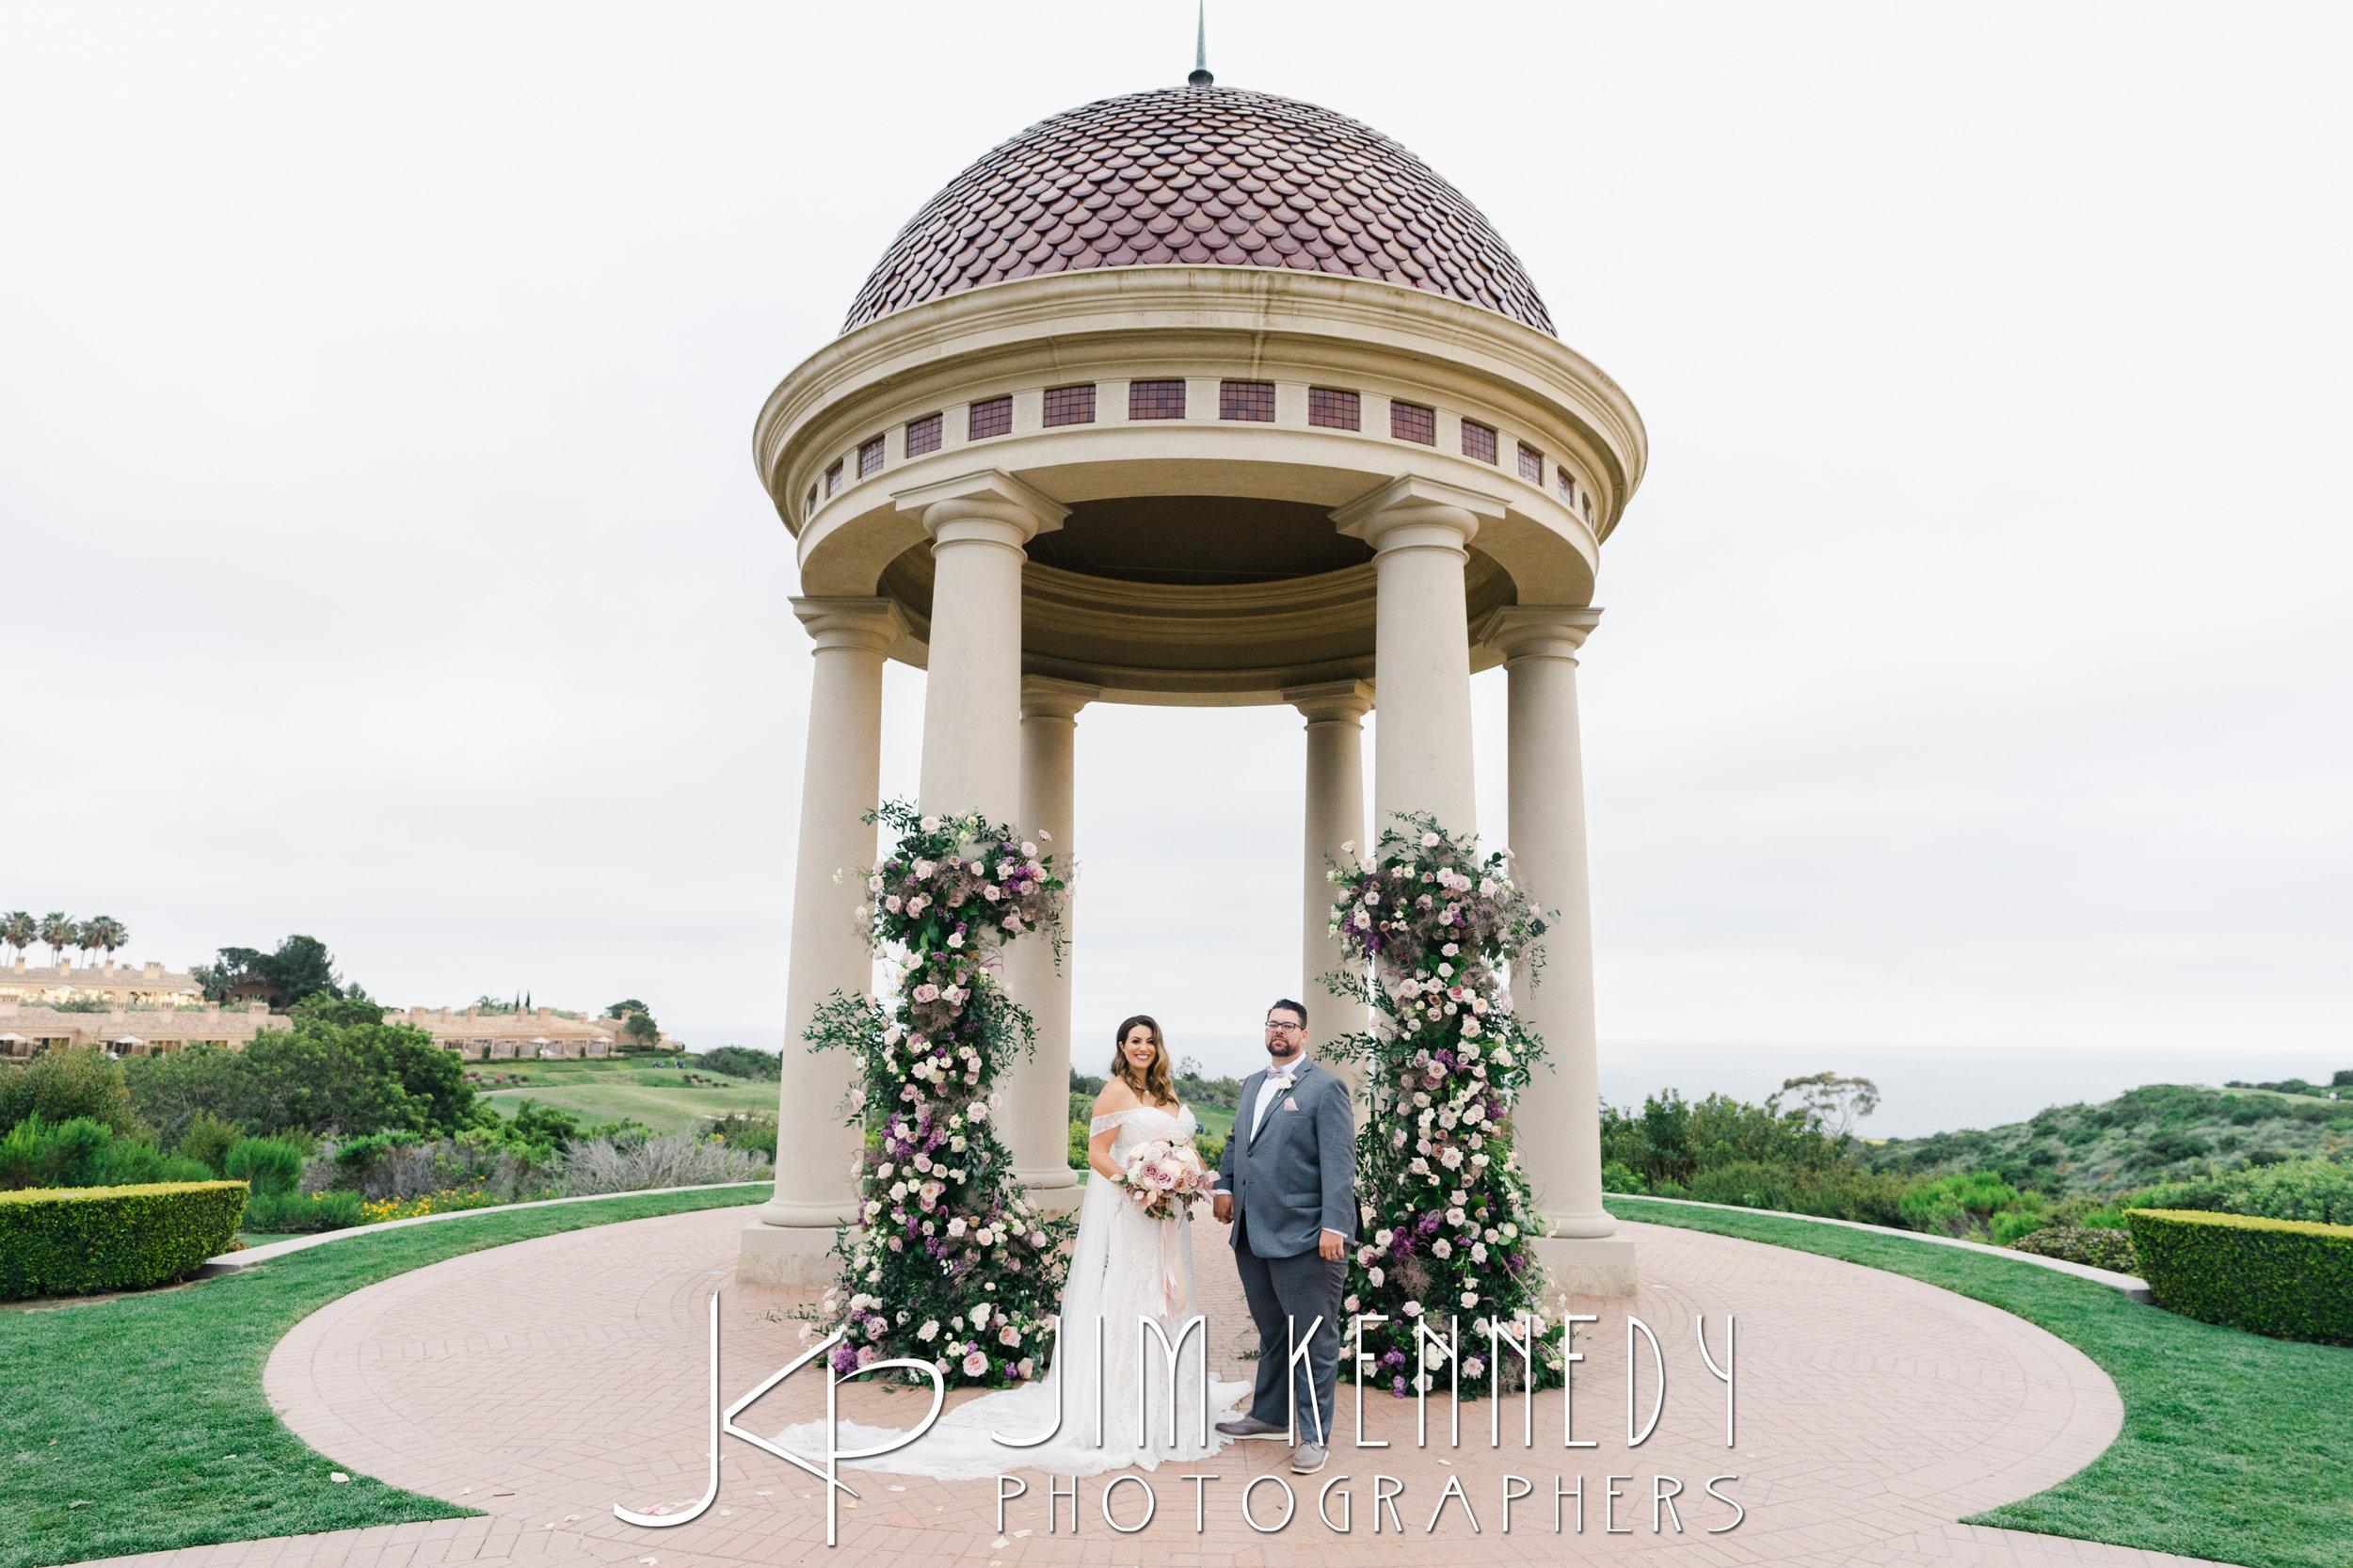 pelican-hill-wedding-jim-kenedy-photographers_0165.JPG